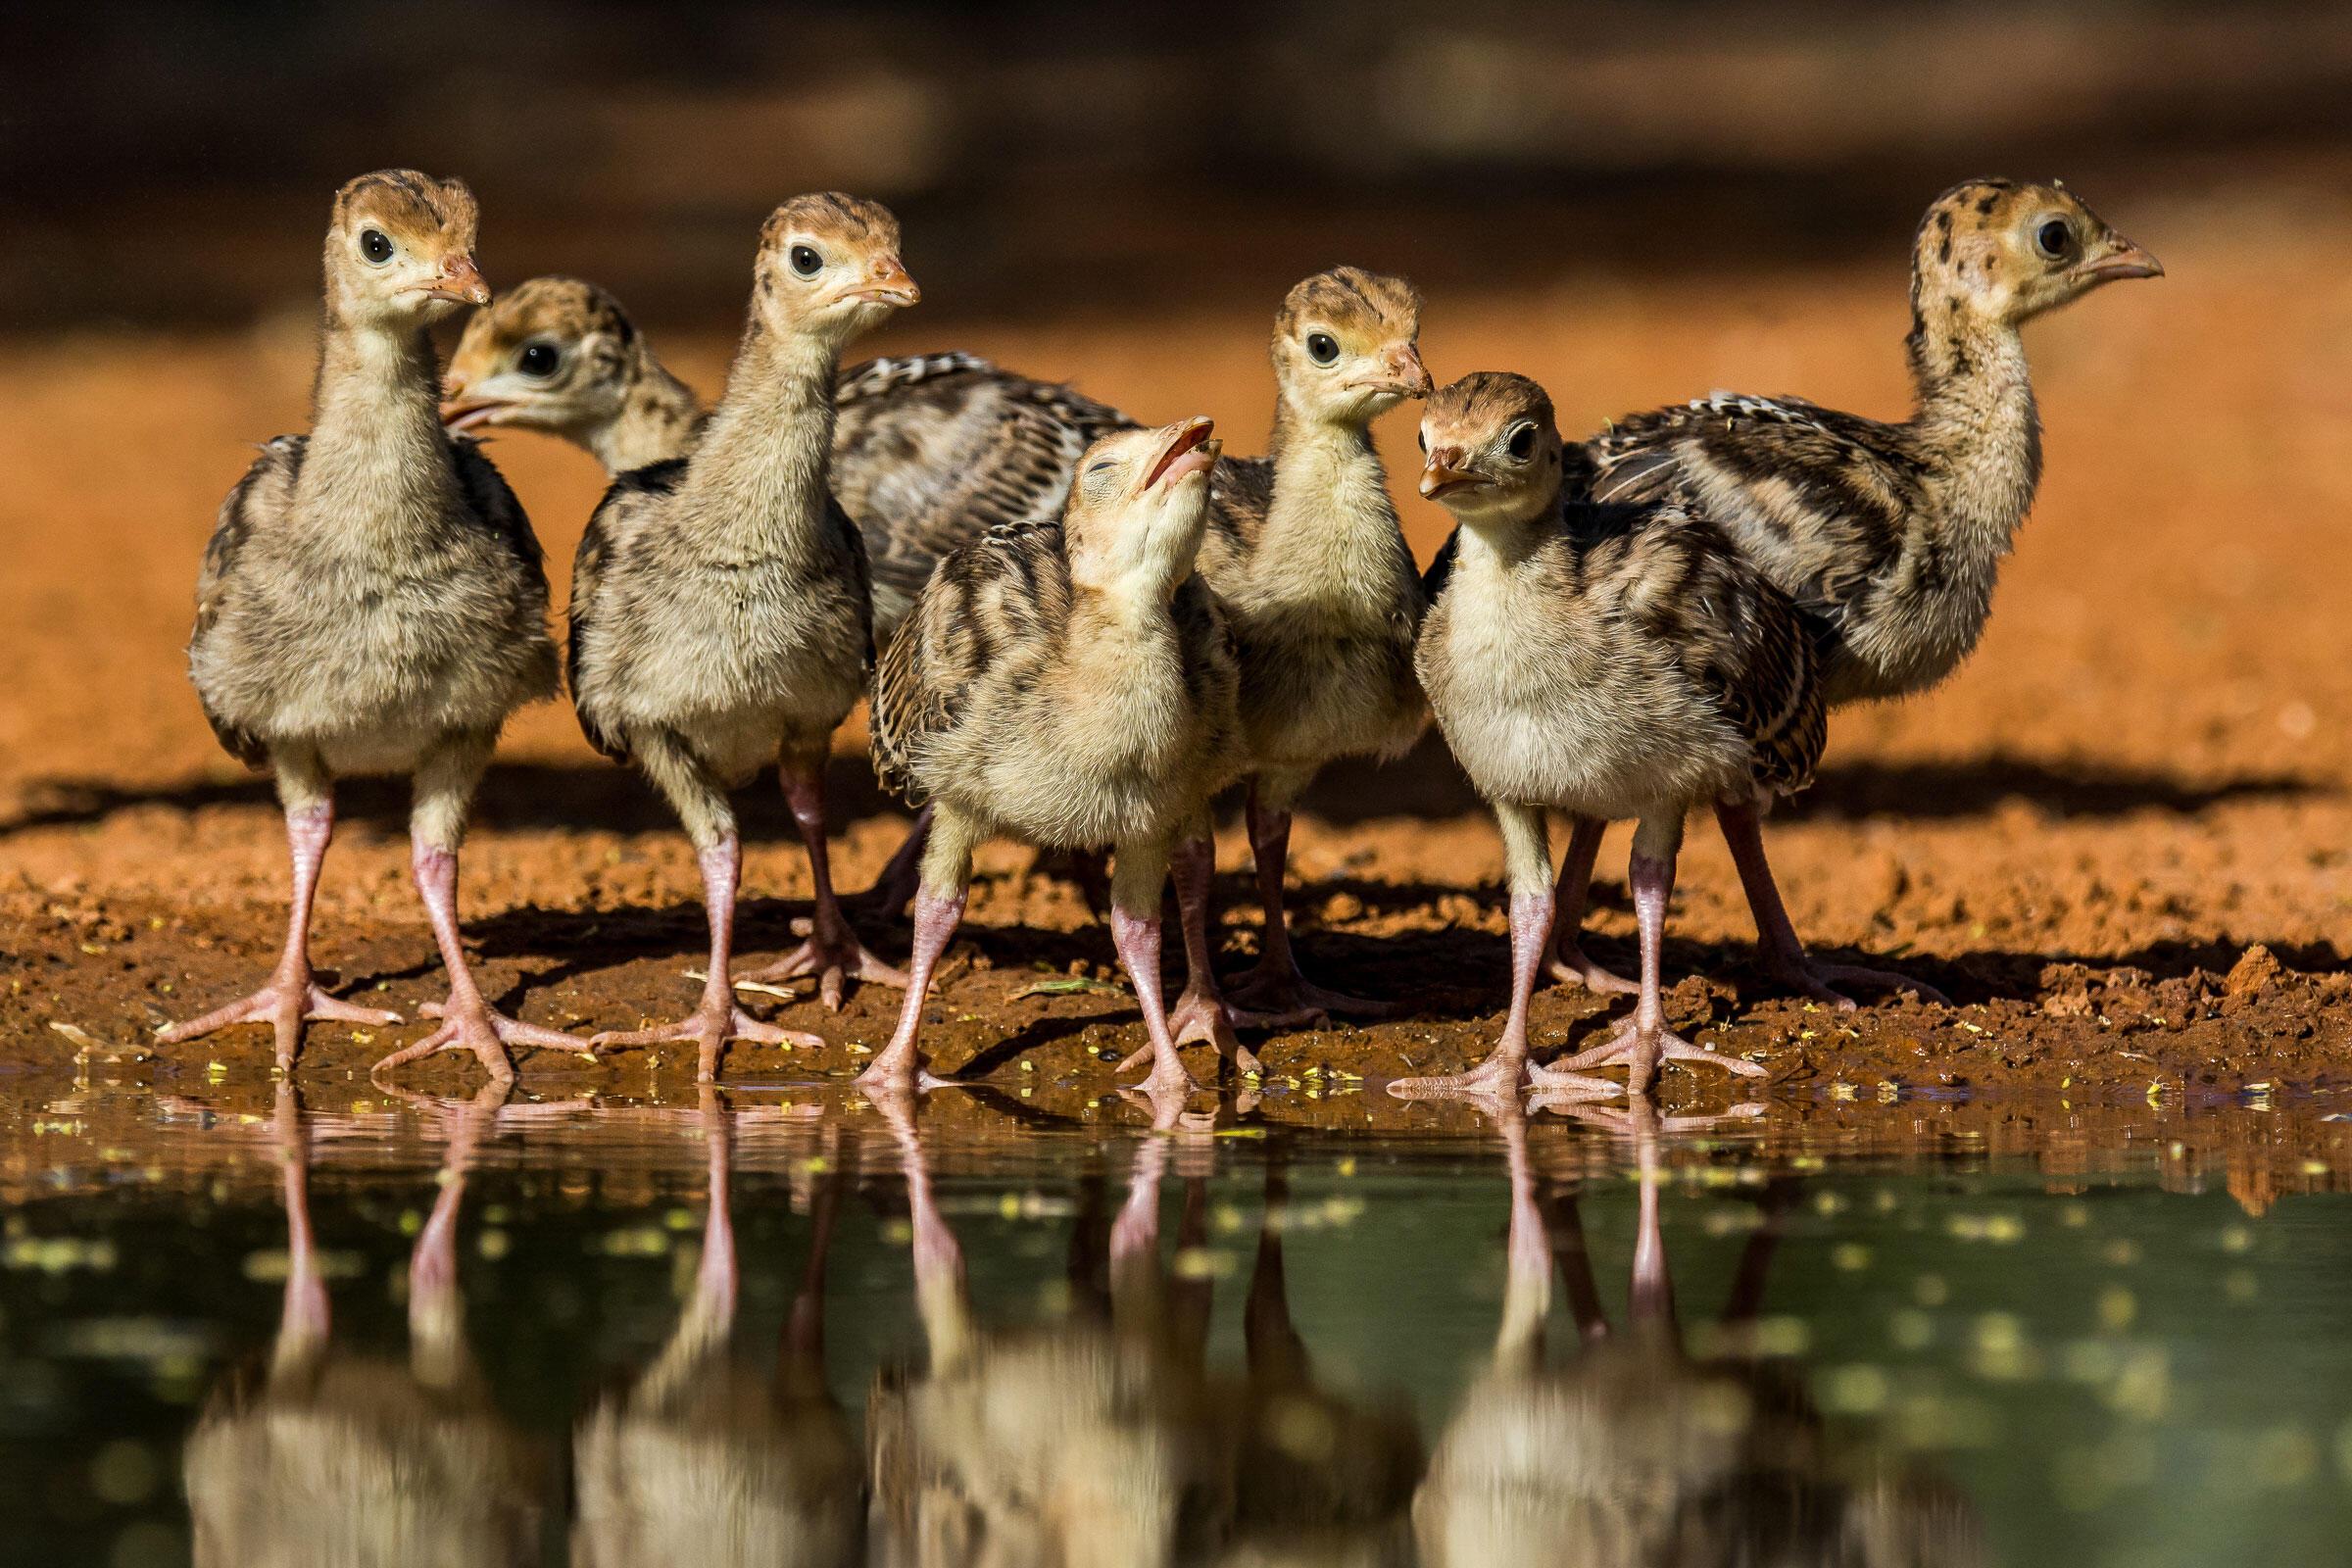 Turkey Poults/Amateur Category. Richard Green/Audubon Photography Awards